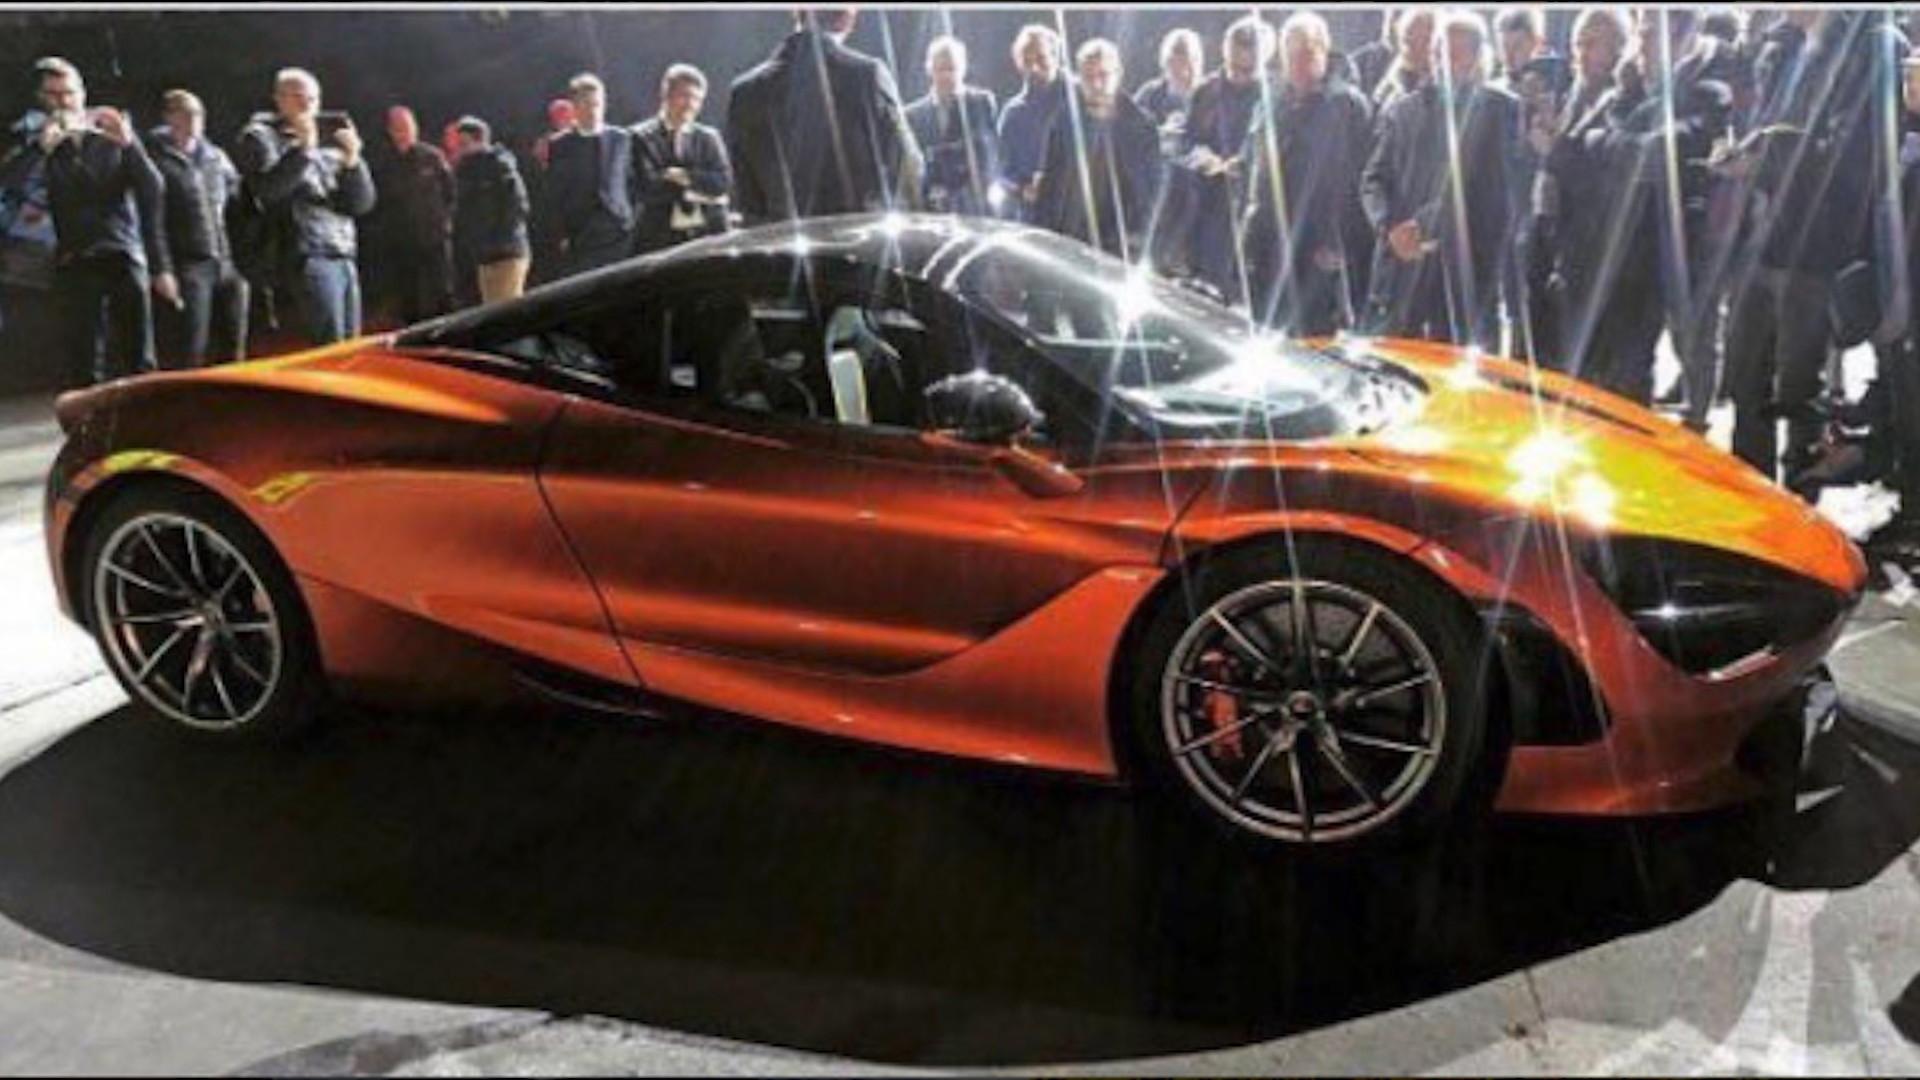 McLaren 720S leaked ahead of 2017 Geneva auto show debut - Image via Lamborghiniks